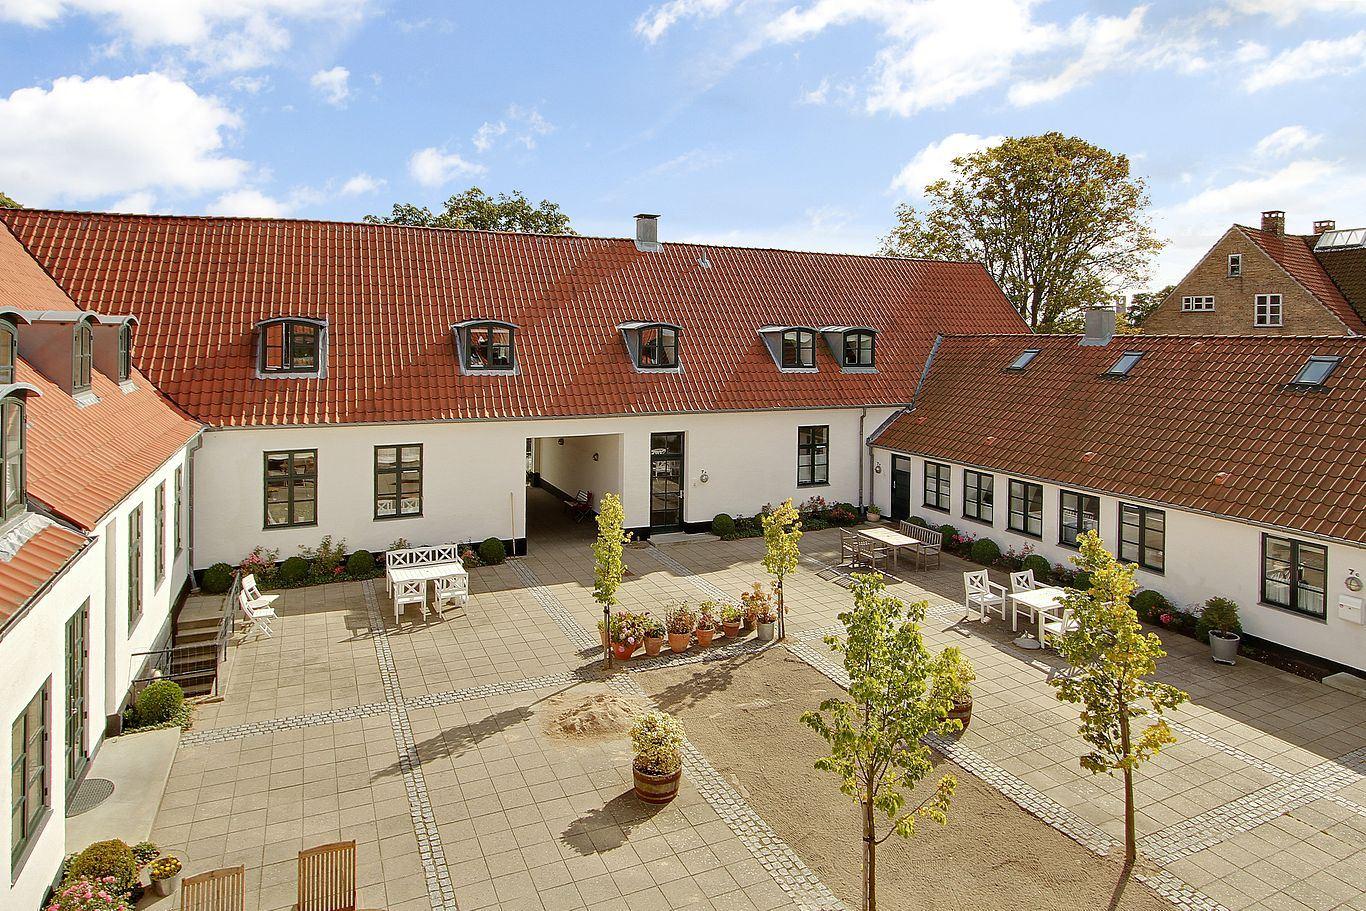 Nørregade 7A, 1. th., 2800 Kongens Lyngby